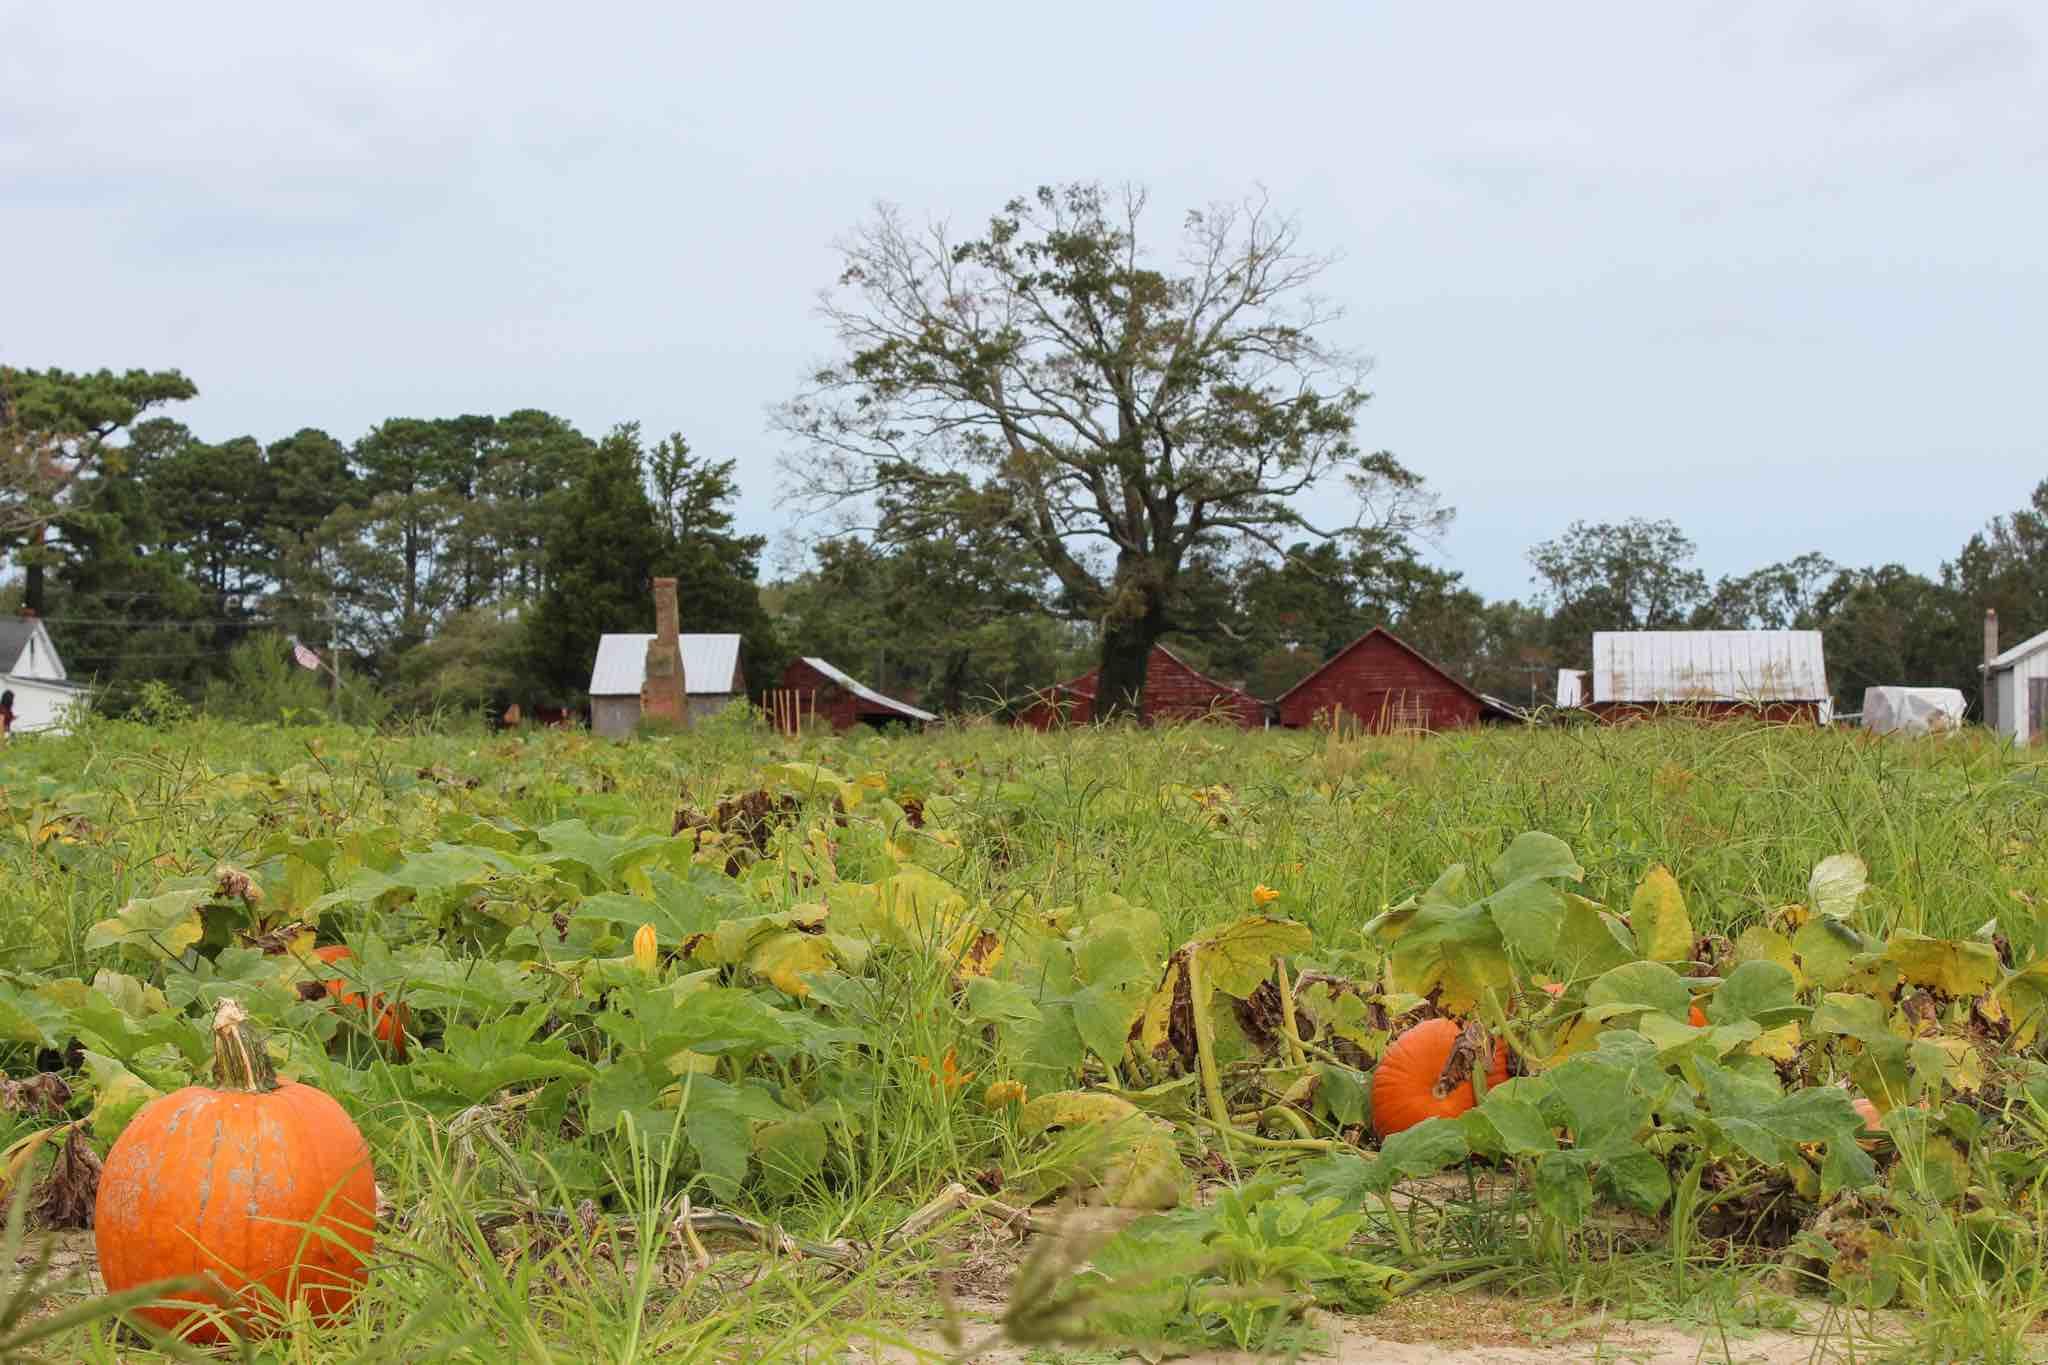 The Pumpkin Picking